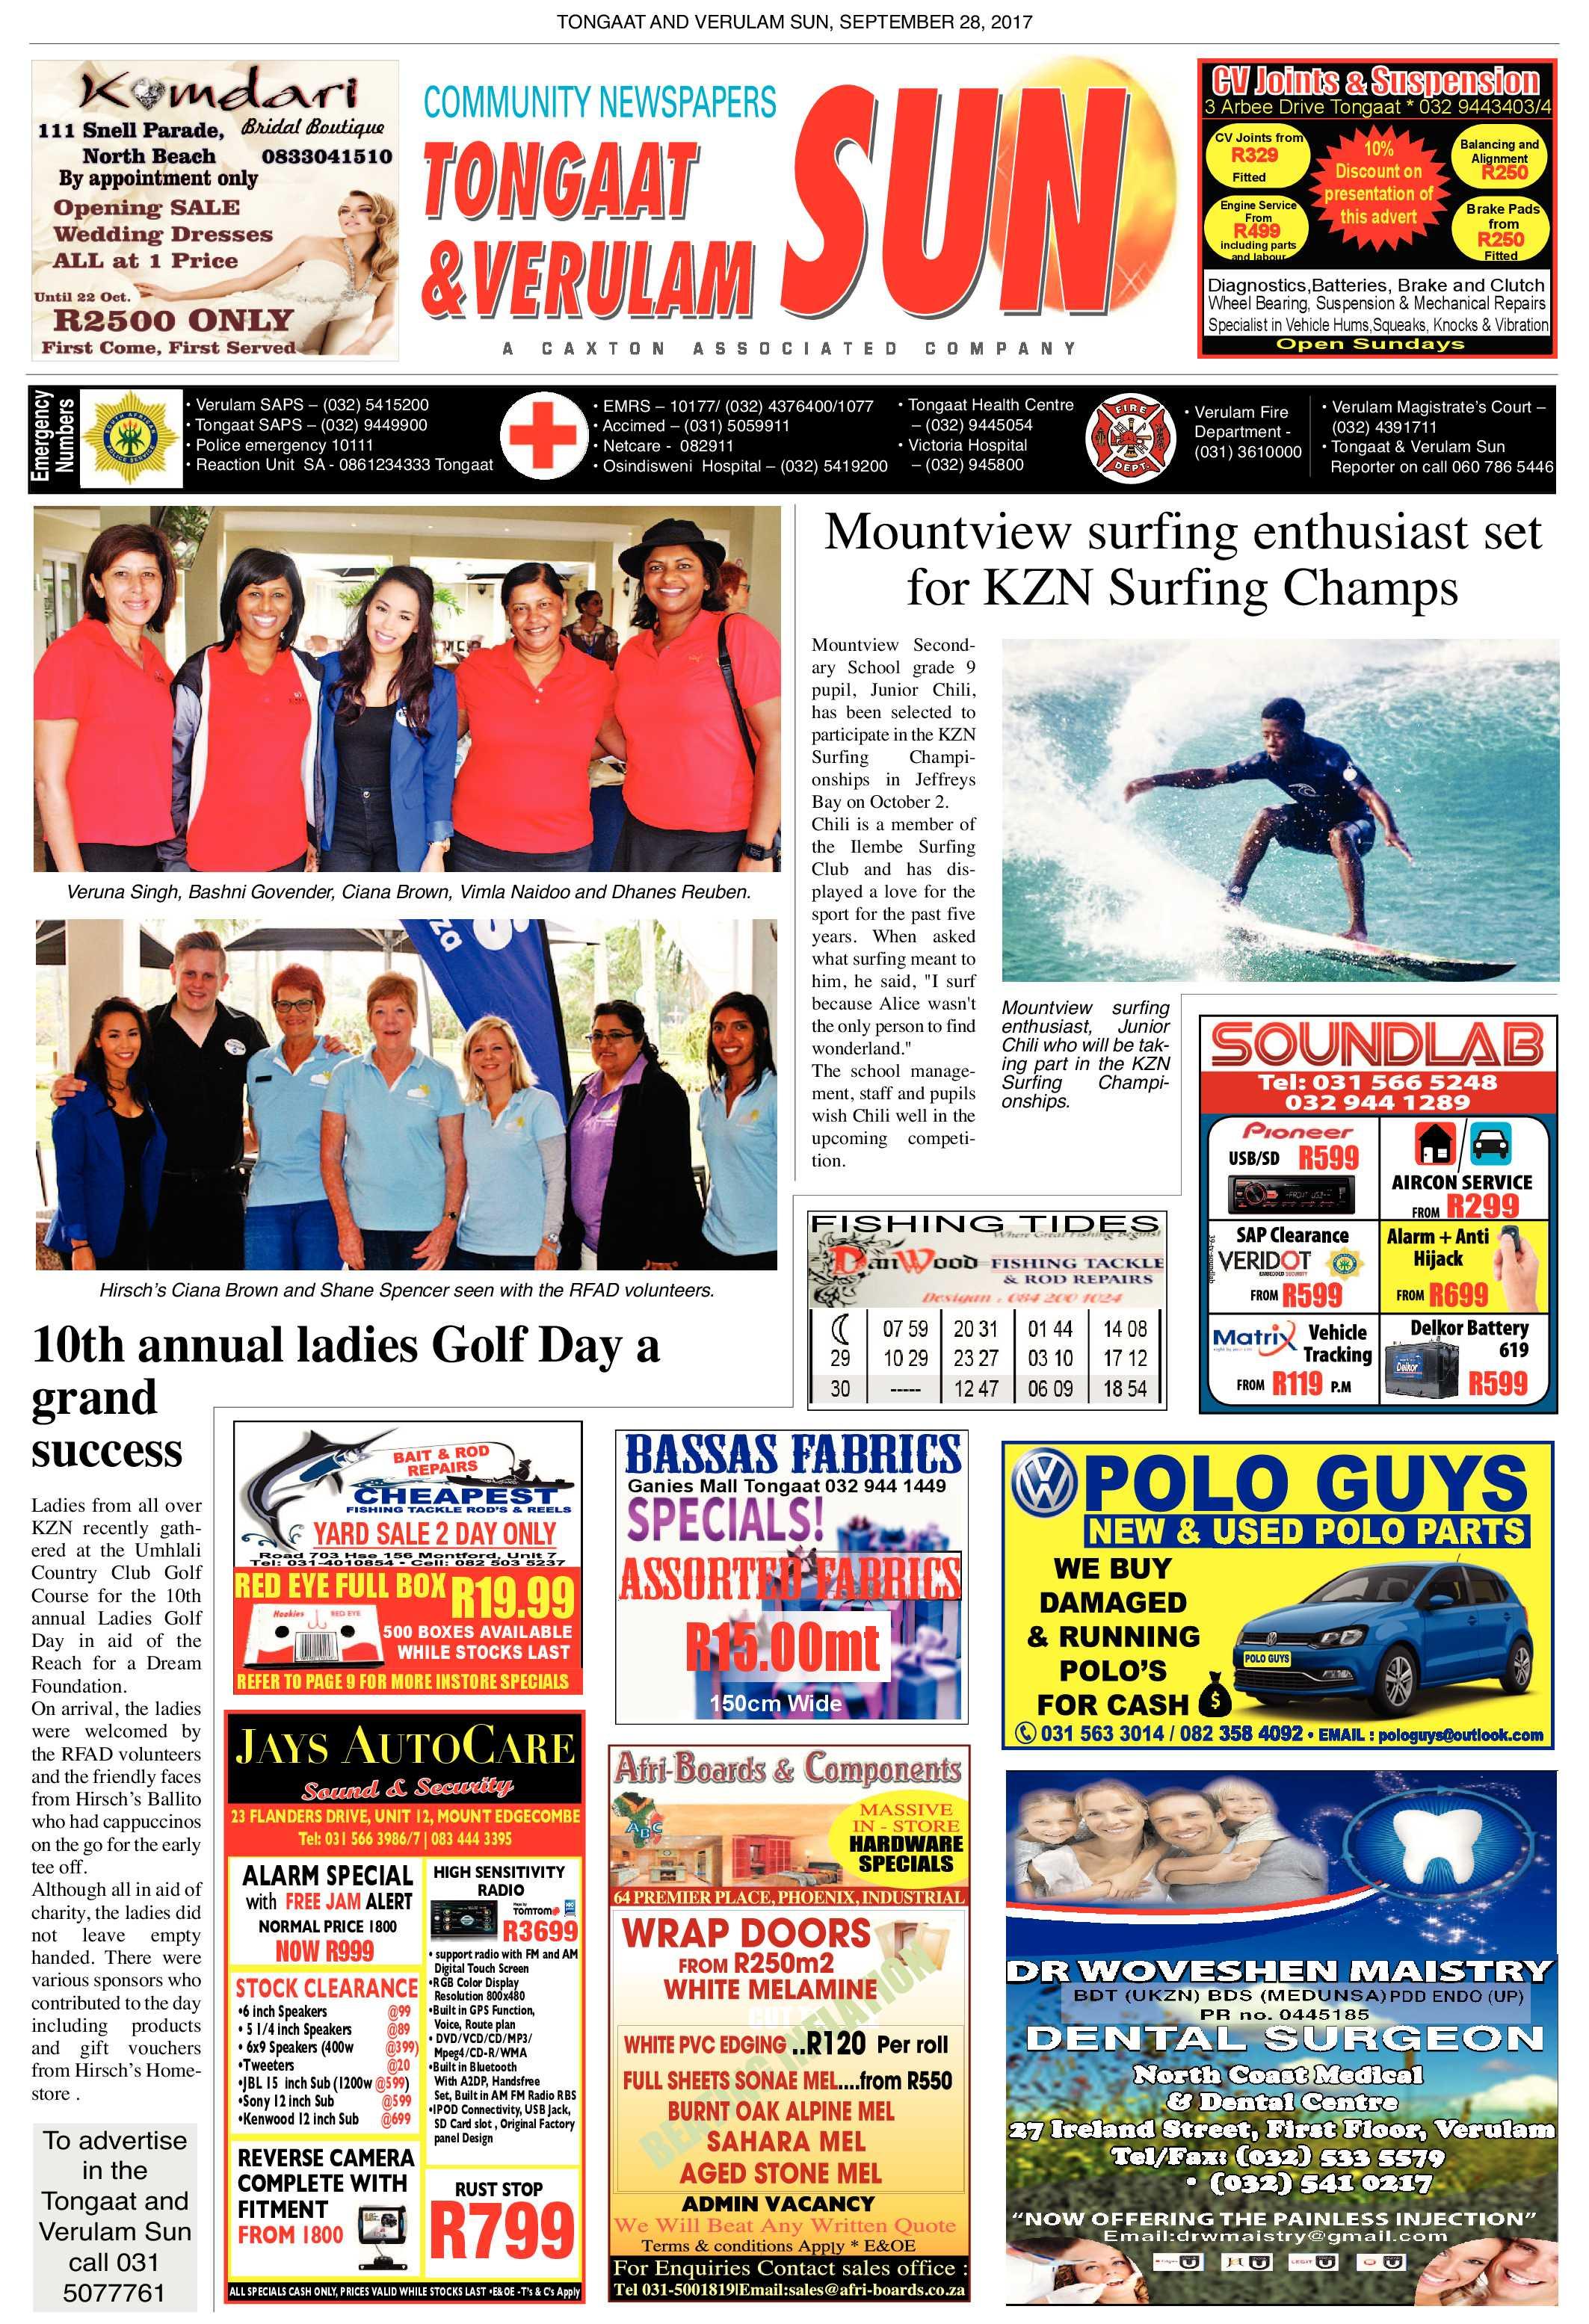 tongaat-verulam-sun-september-28-epapers-page-12